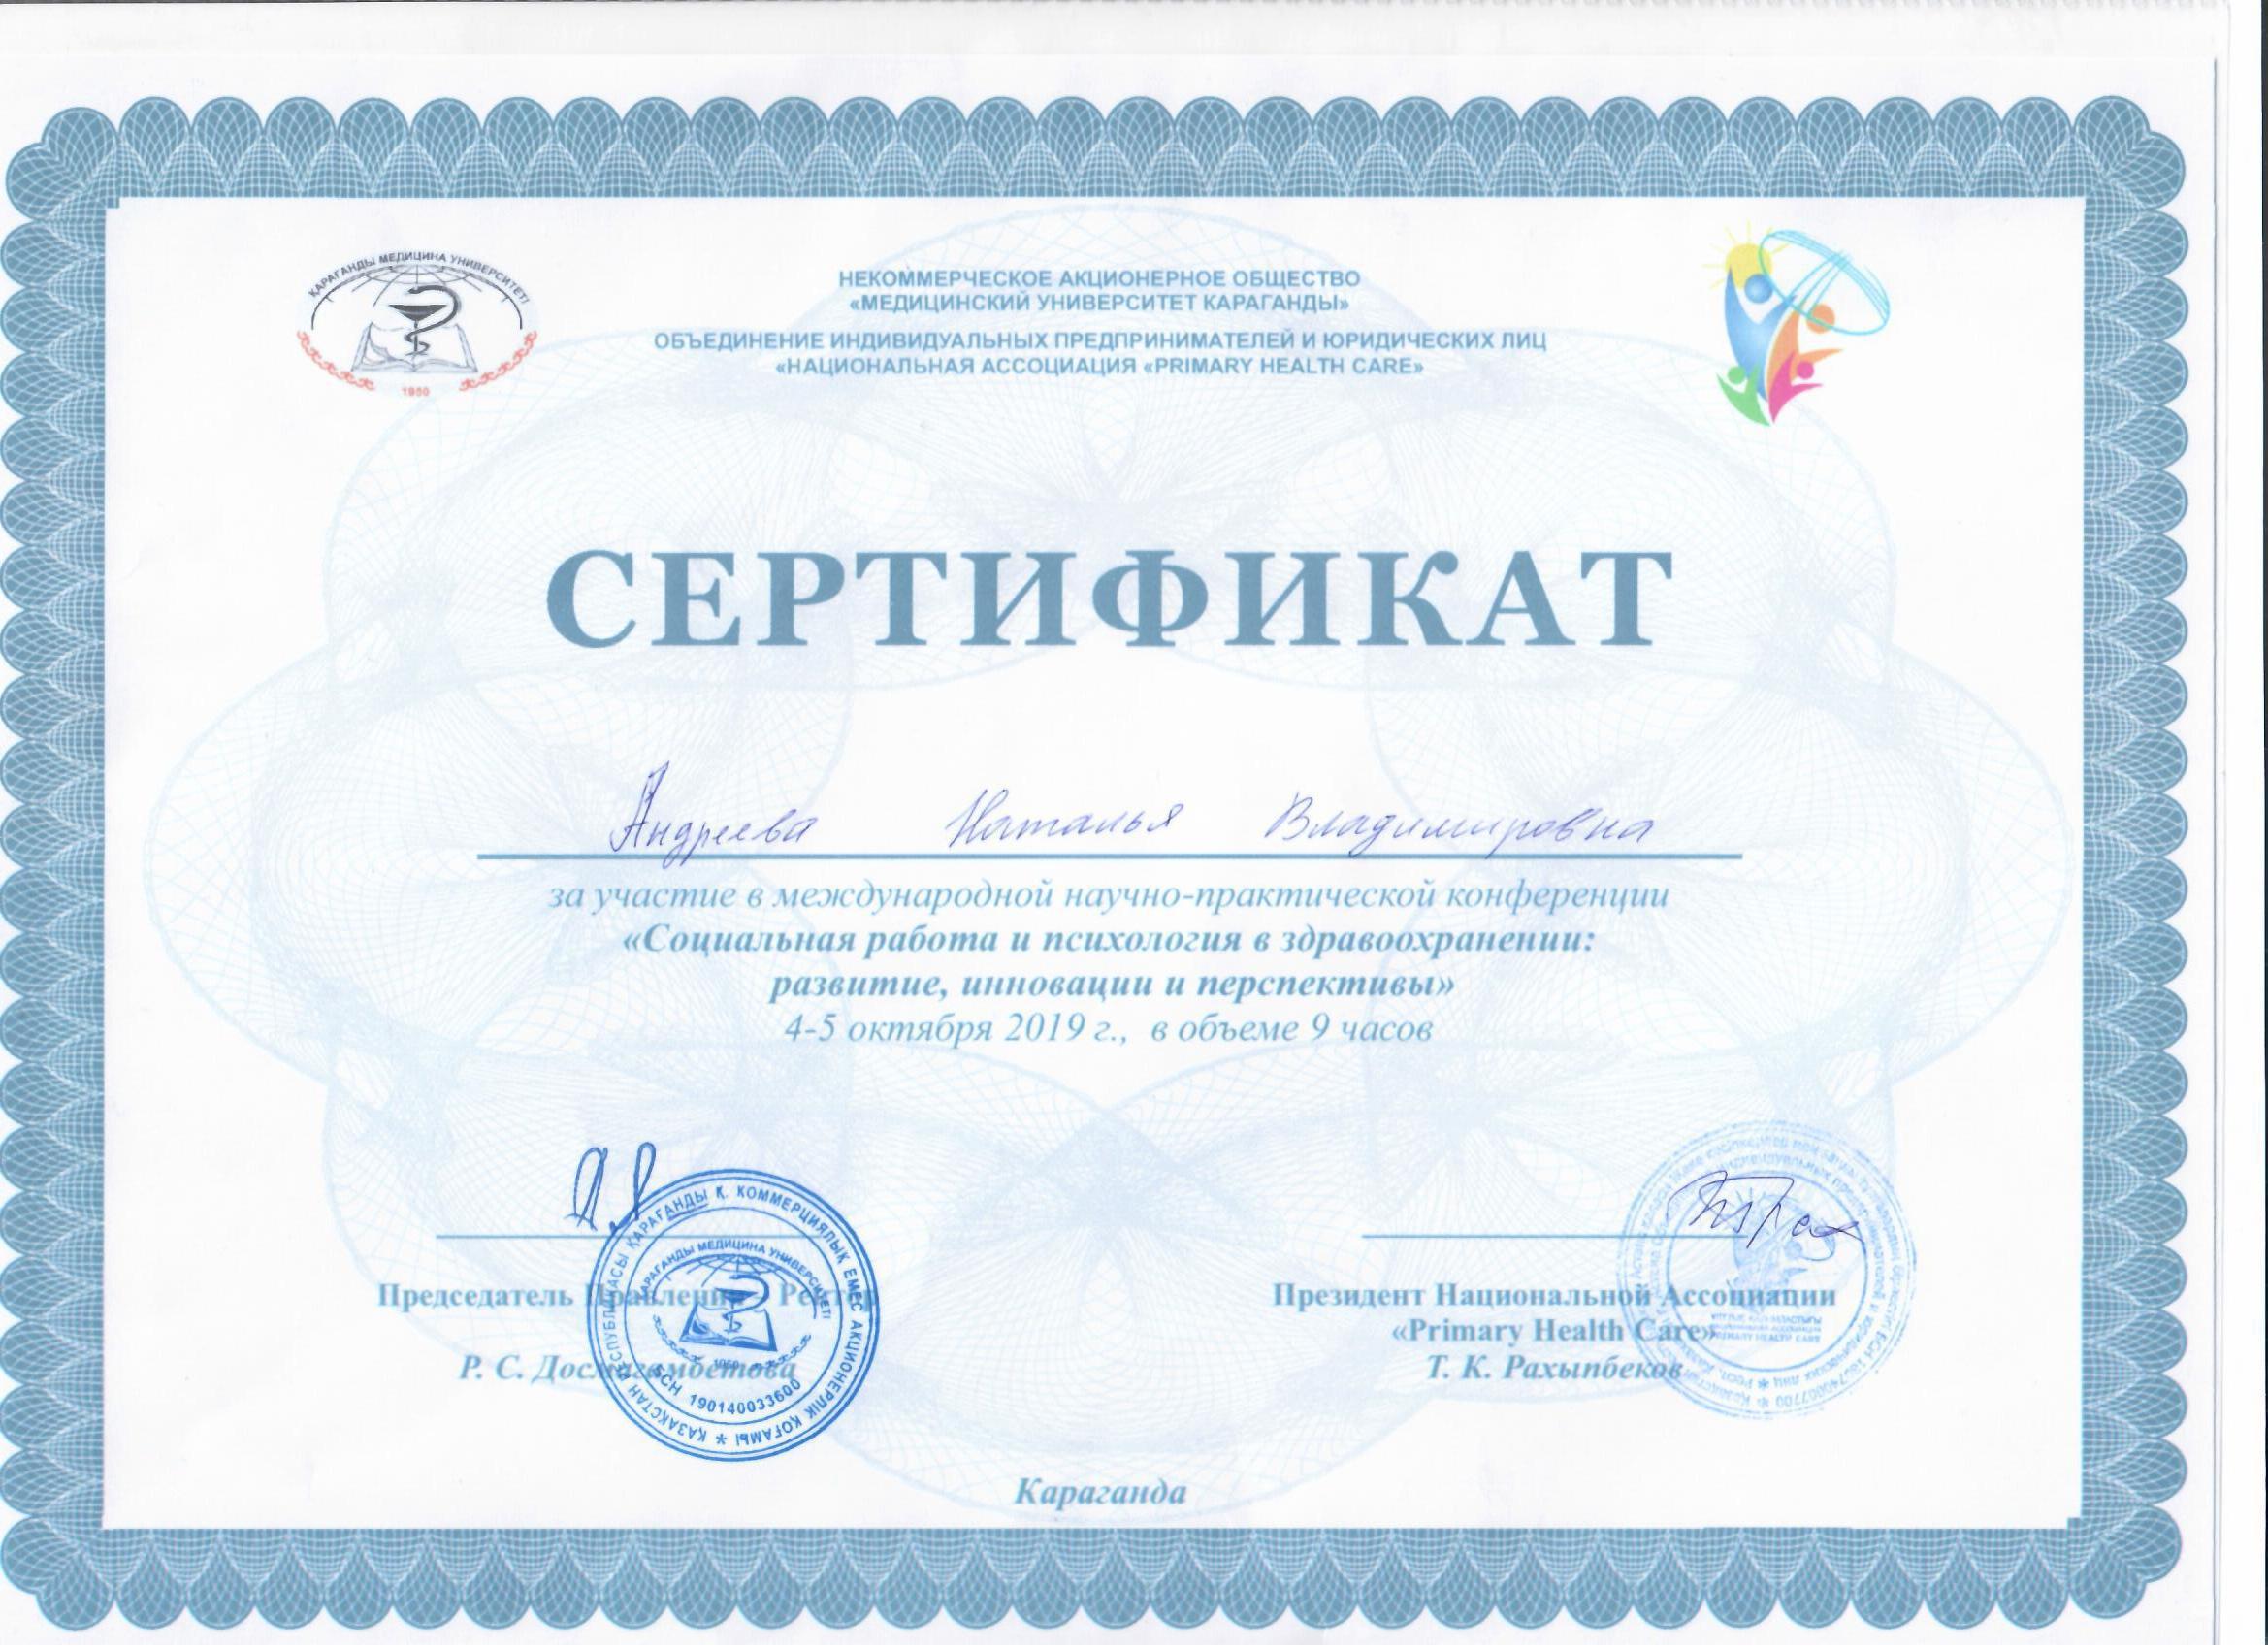 Сертификат психолога Натальи Андреевой